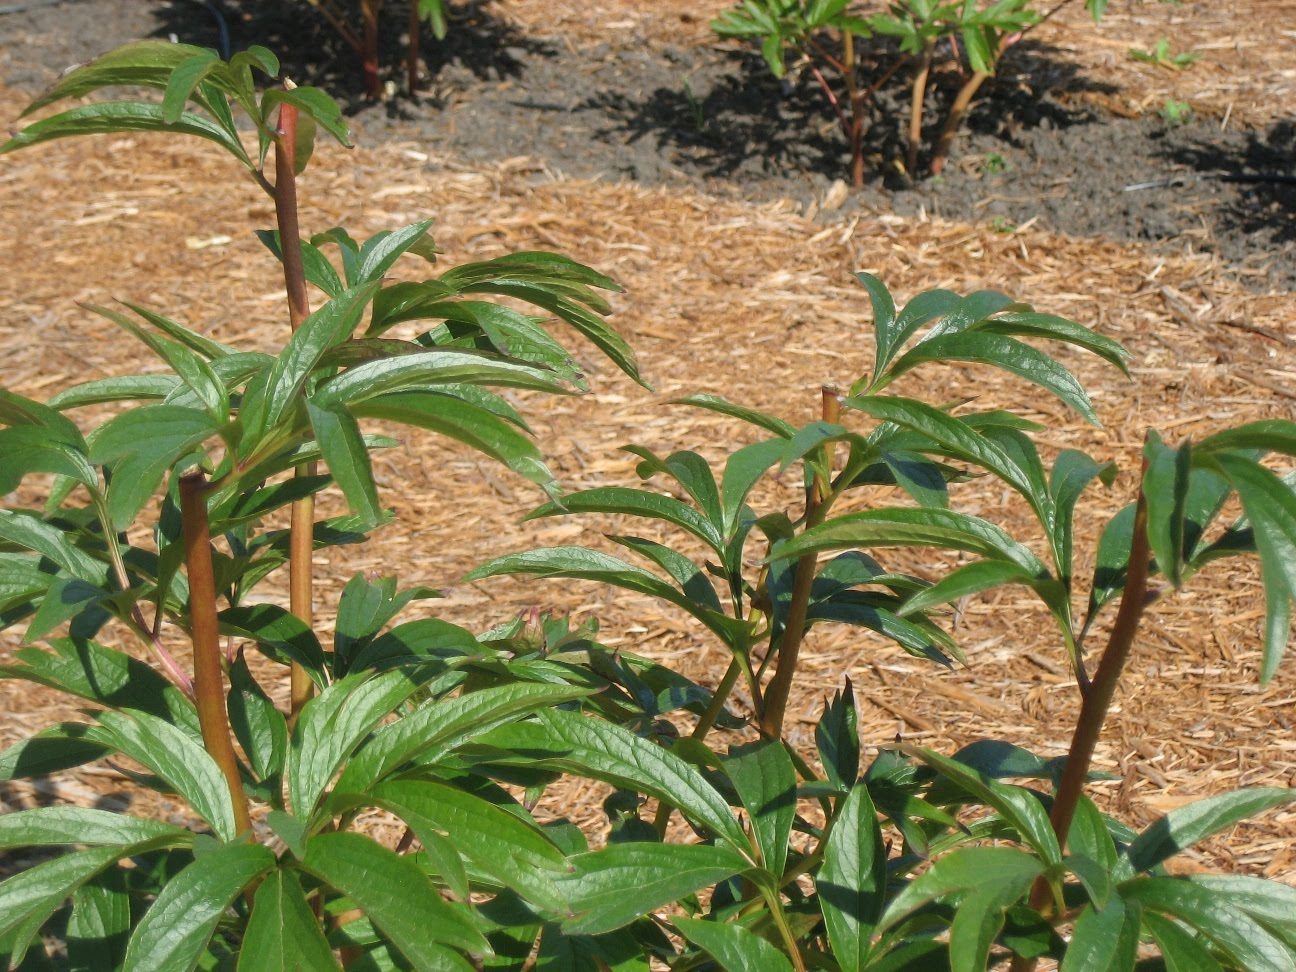 new peony plant at peony farm - How To Cut Peonies